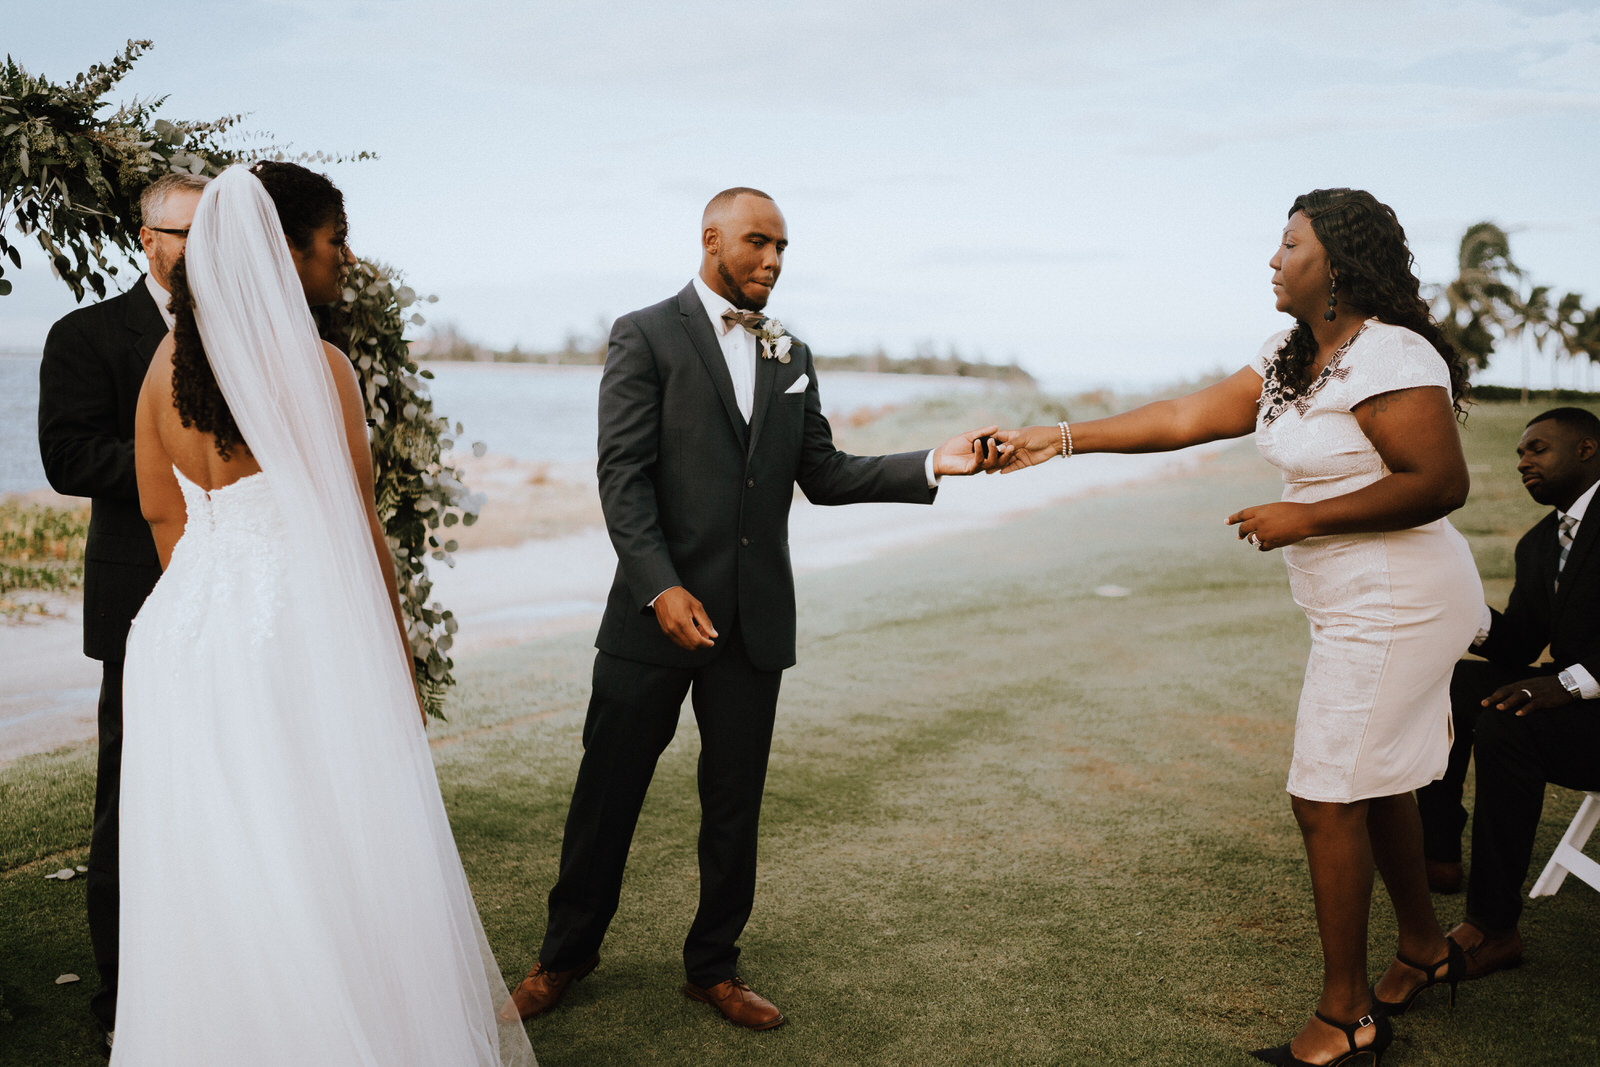 South Seas Island Resort Elopement- Alyana and Shawn- Michelle Gonzalez Photography-476.JPG